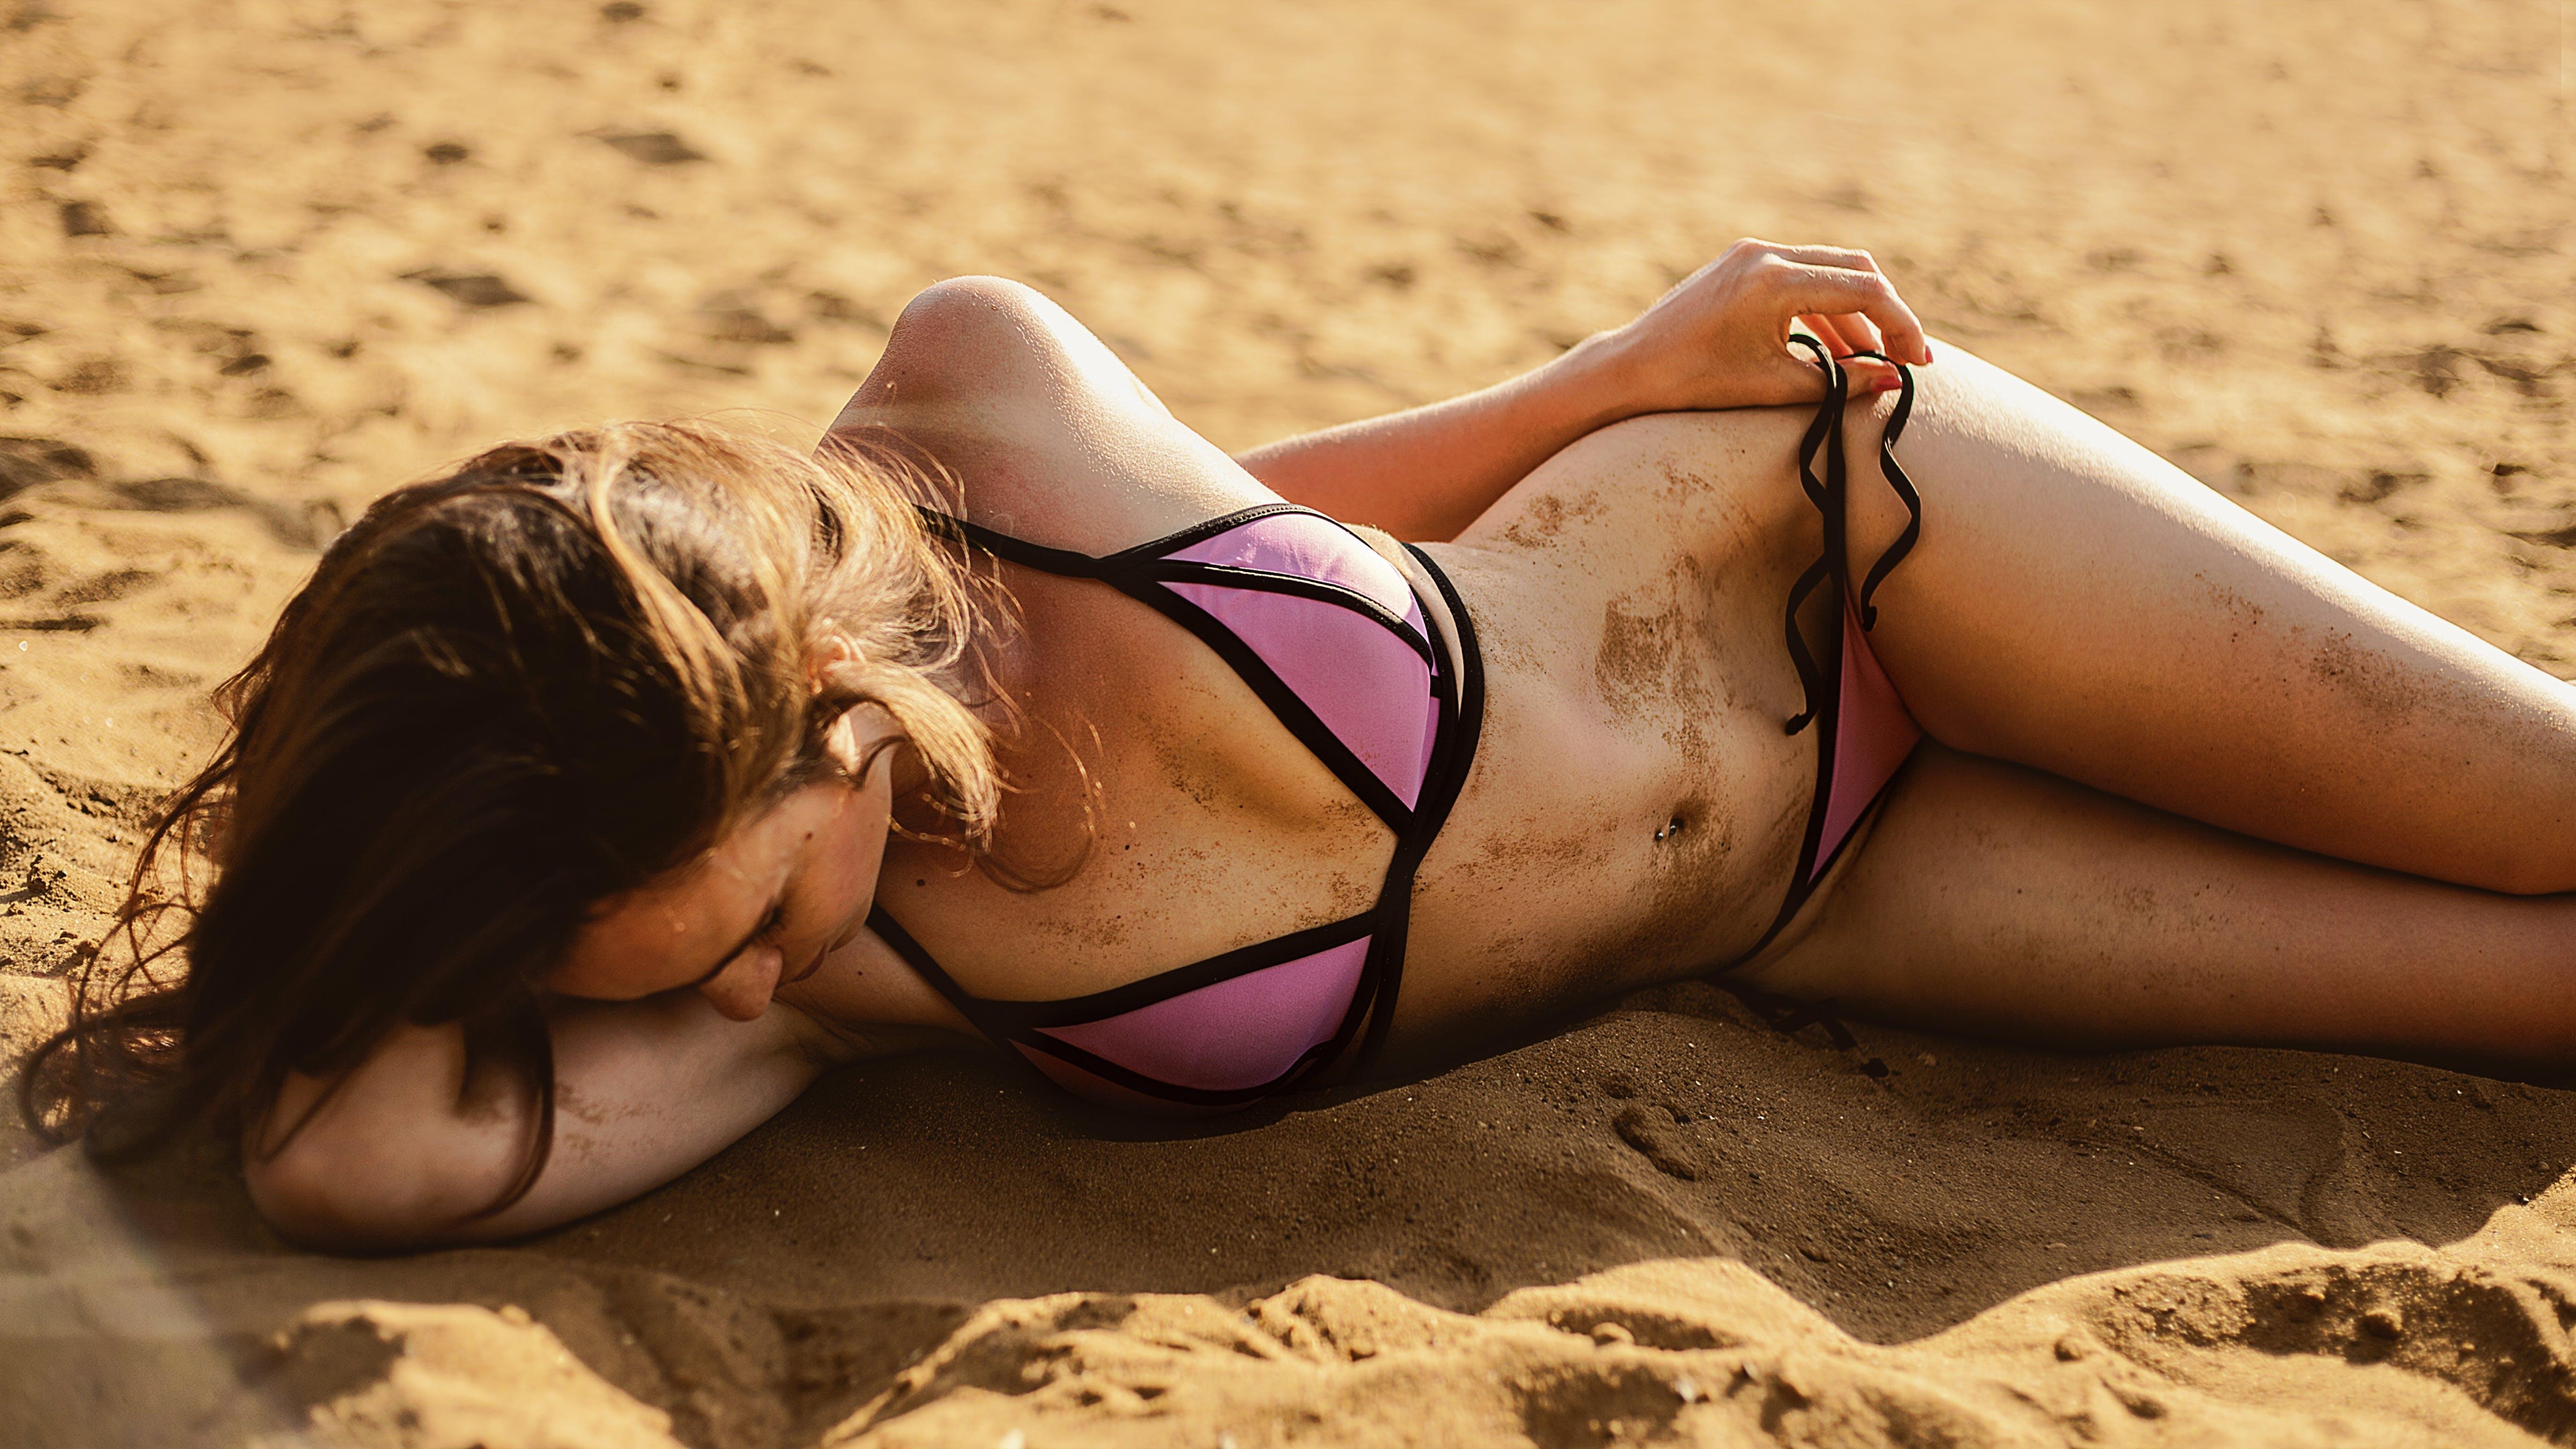 adult, attractive, beach